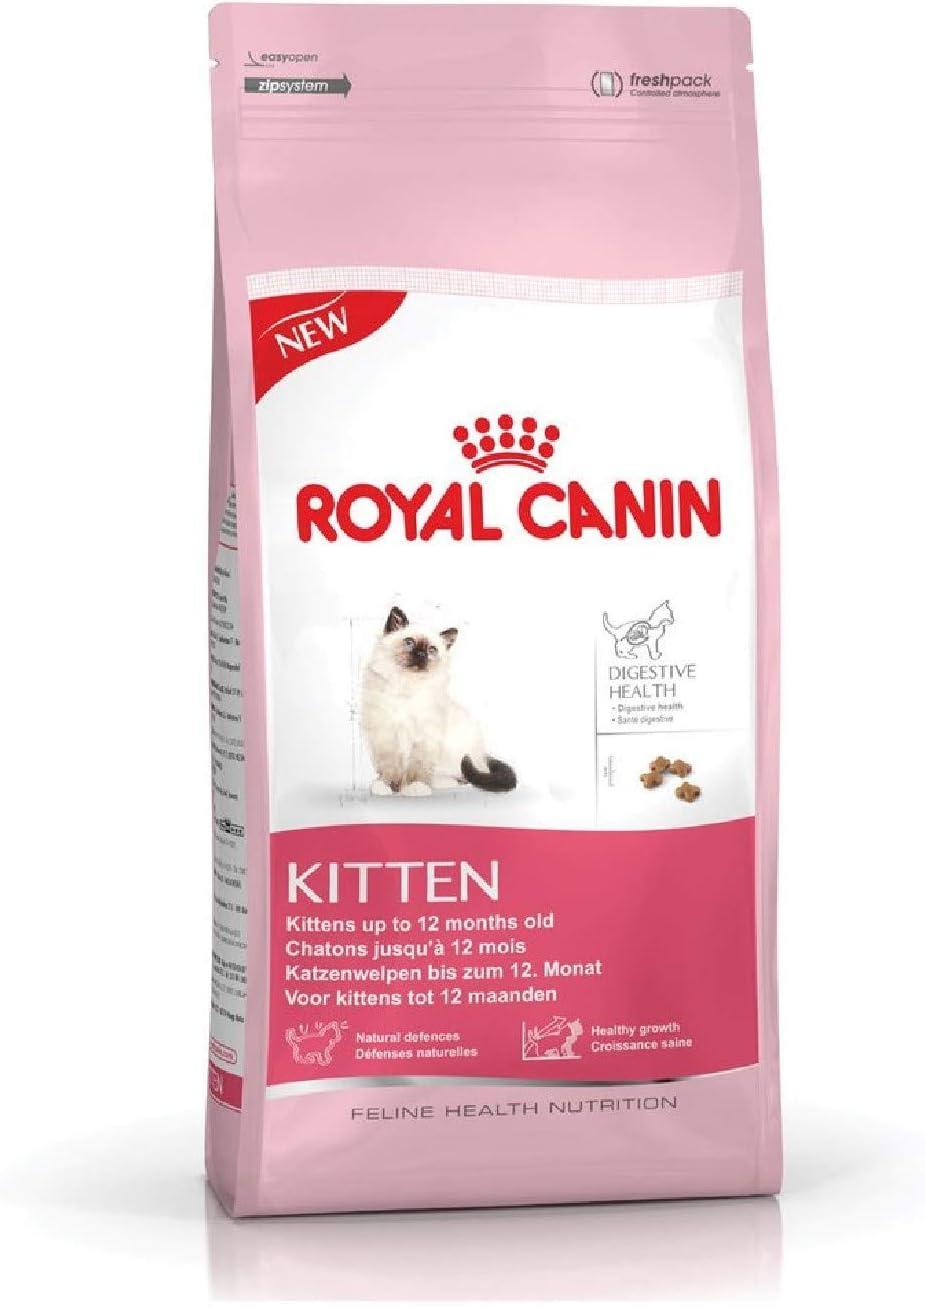 Royal Canin Kitten 10 kg: Amazon.es: Productos para mascotas